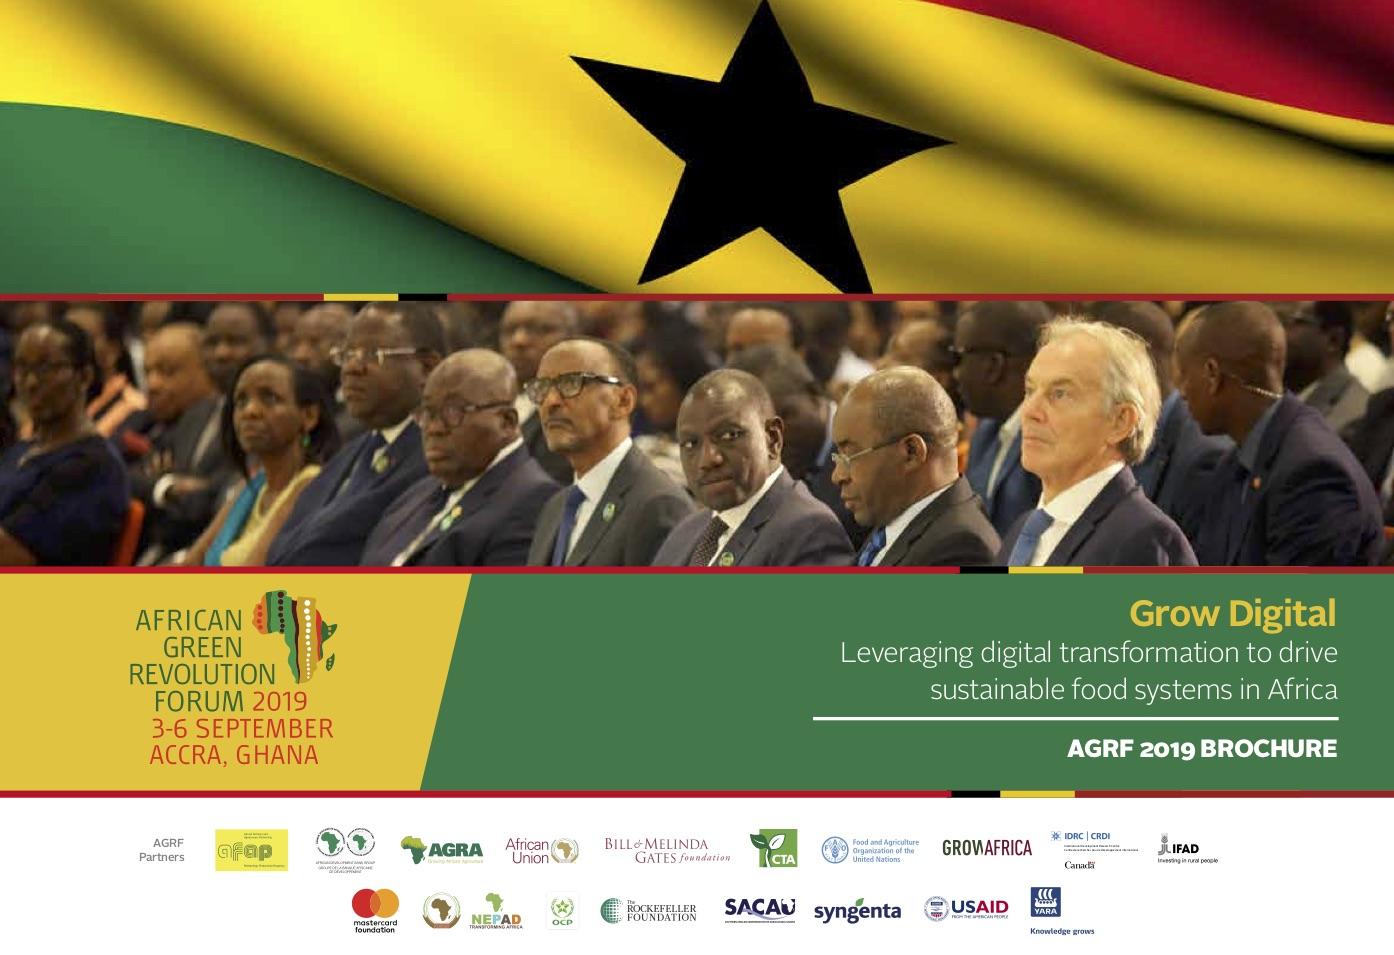 African Green Revolution Forum (AGRF) 2019 | CIMMYT